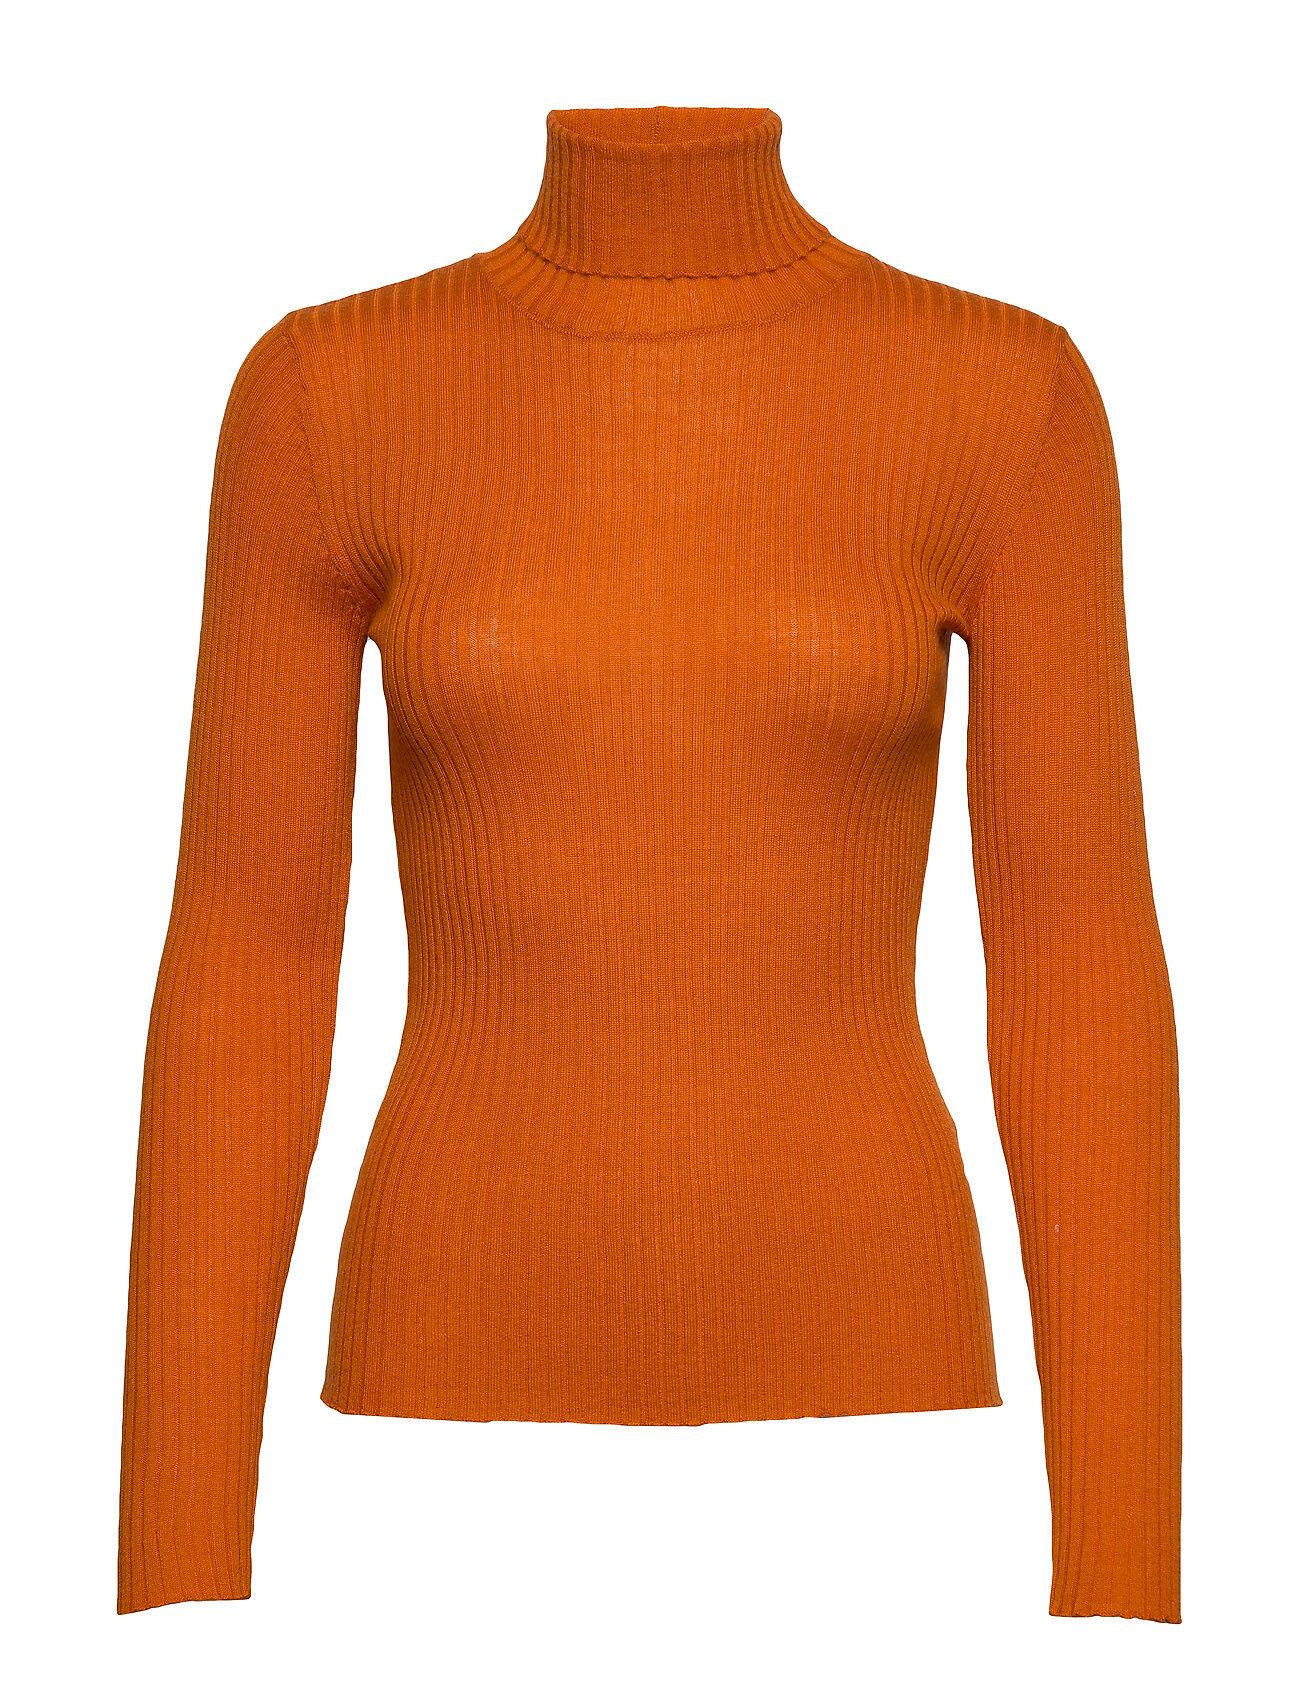 Selected Femme Slfcosta Ls Knit Rib Rollneck B Kilpikonnakaulus Poolopaita Oranssi Selected Femme